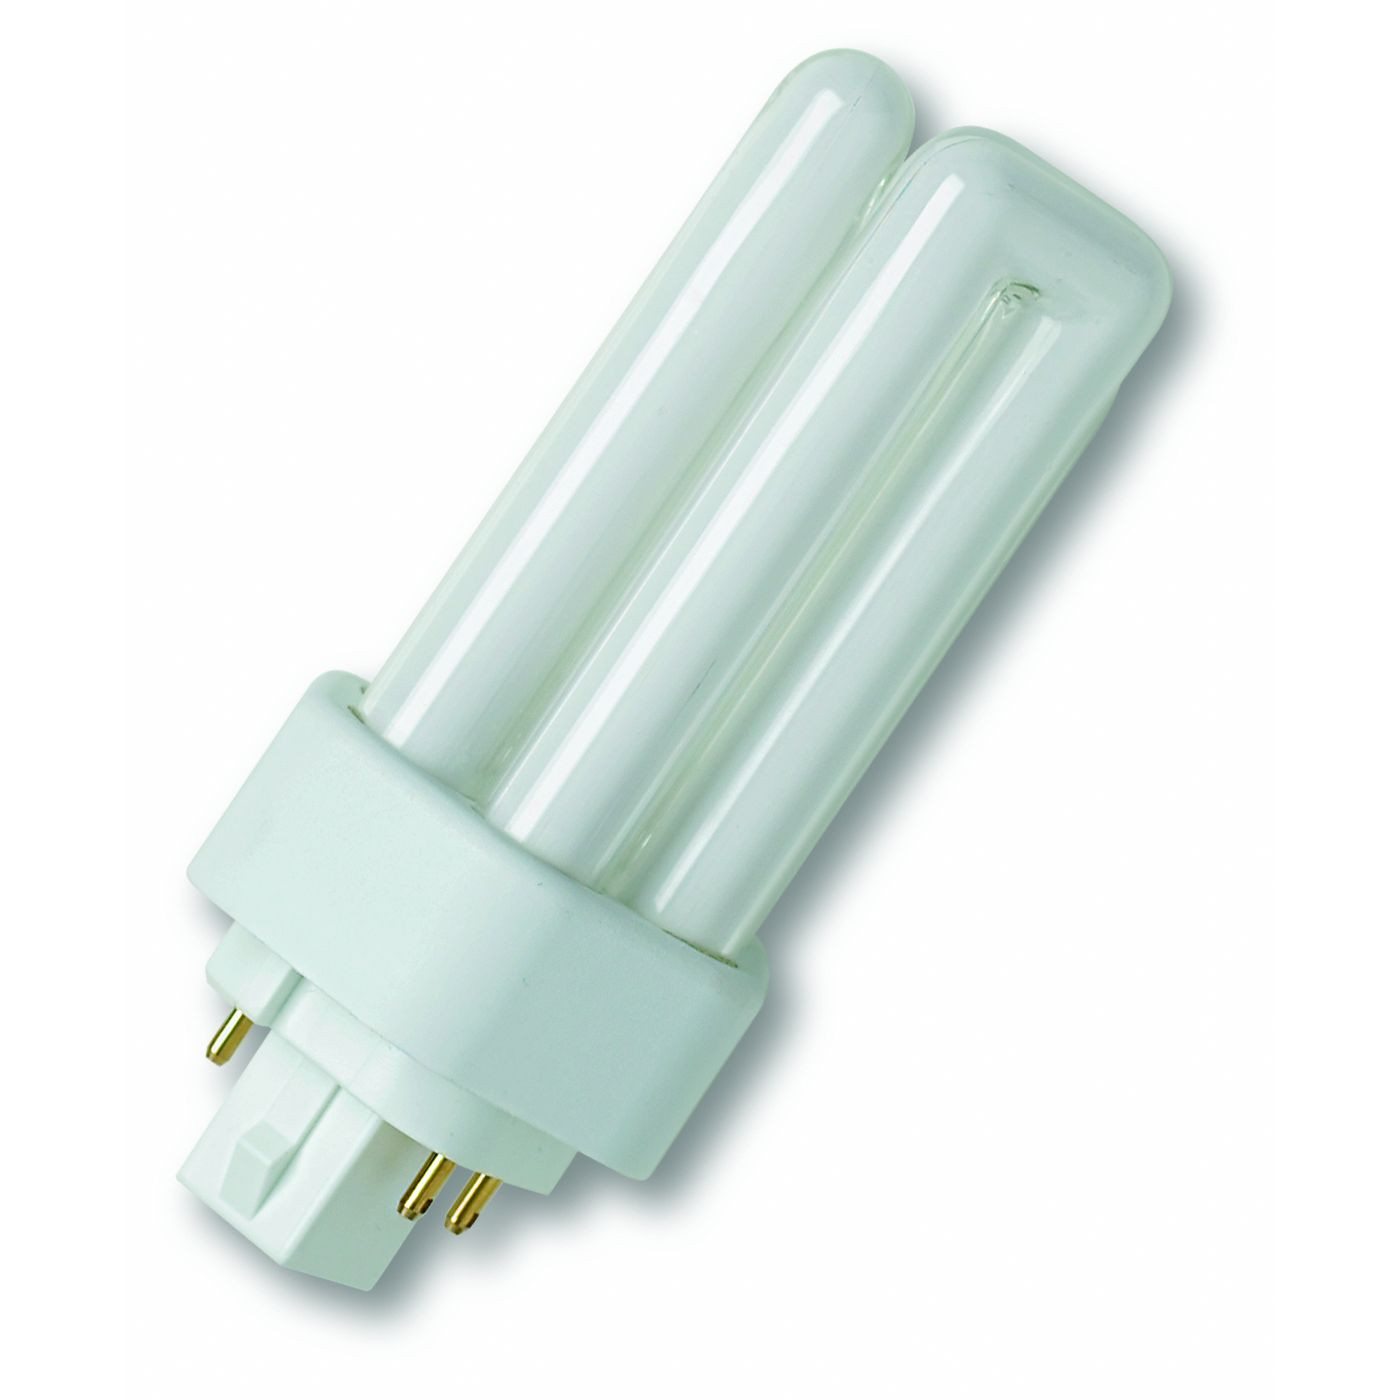 Osram Kompaktleuchtstofflampe Dreifach-Doppelrohr TC-TEL 32W/830 GX24q-3 warmweiß